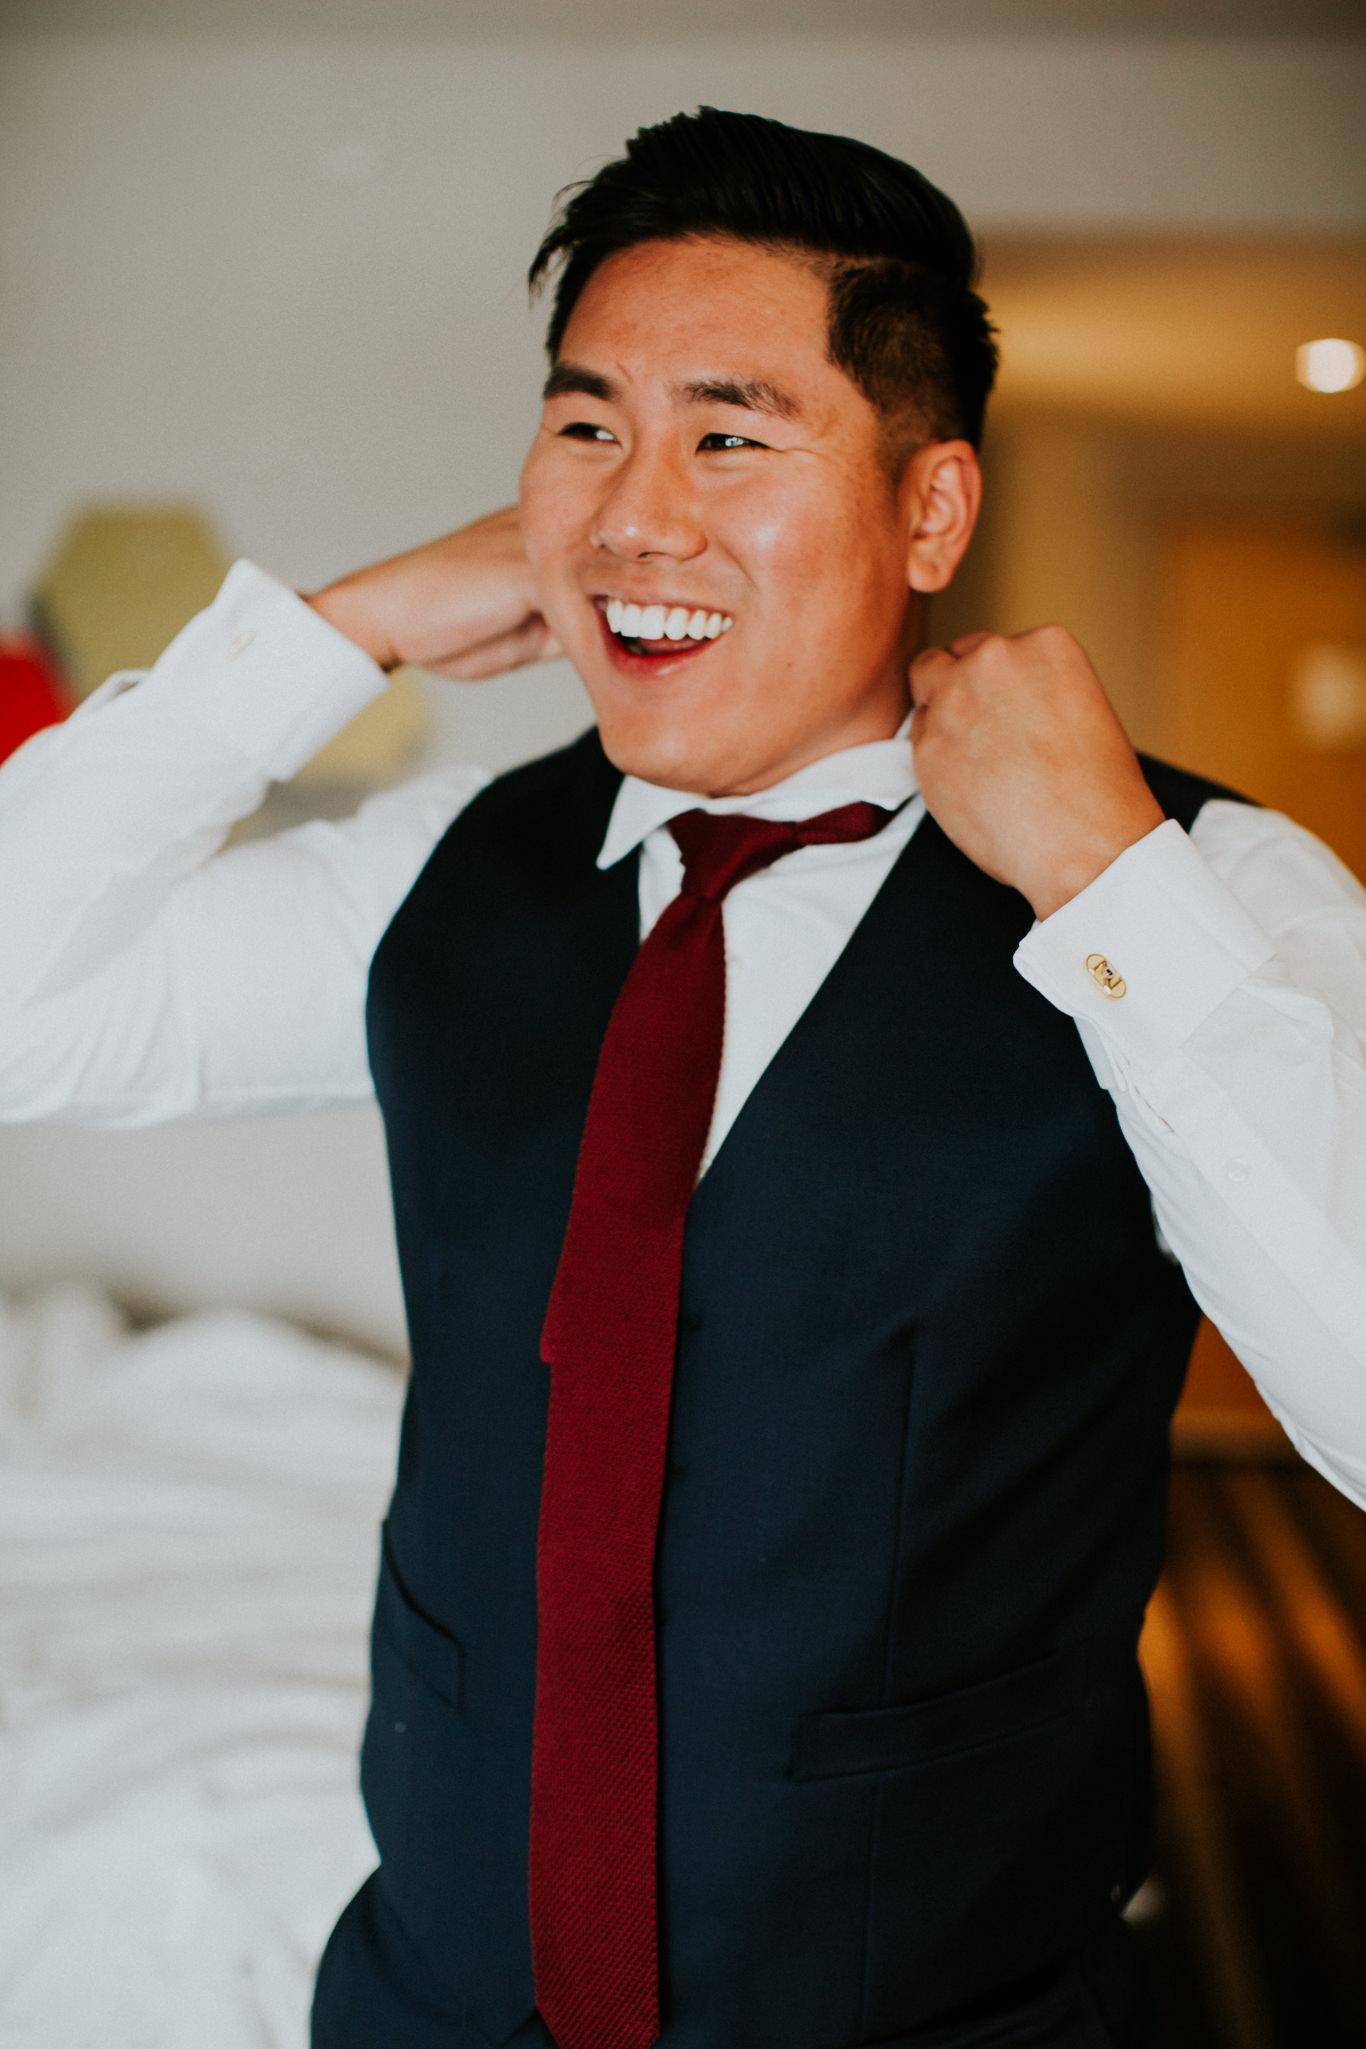 hotel arts wedding in calgary